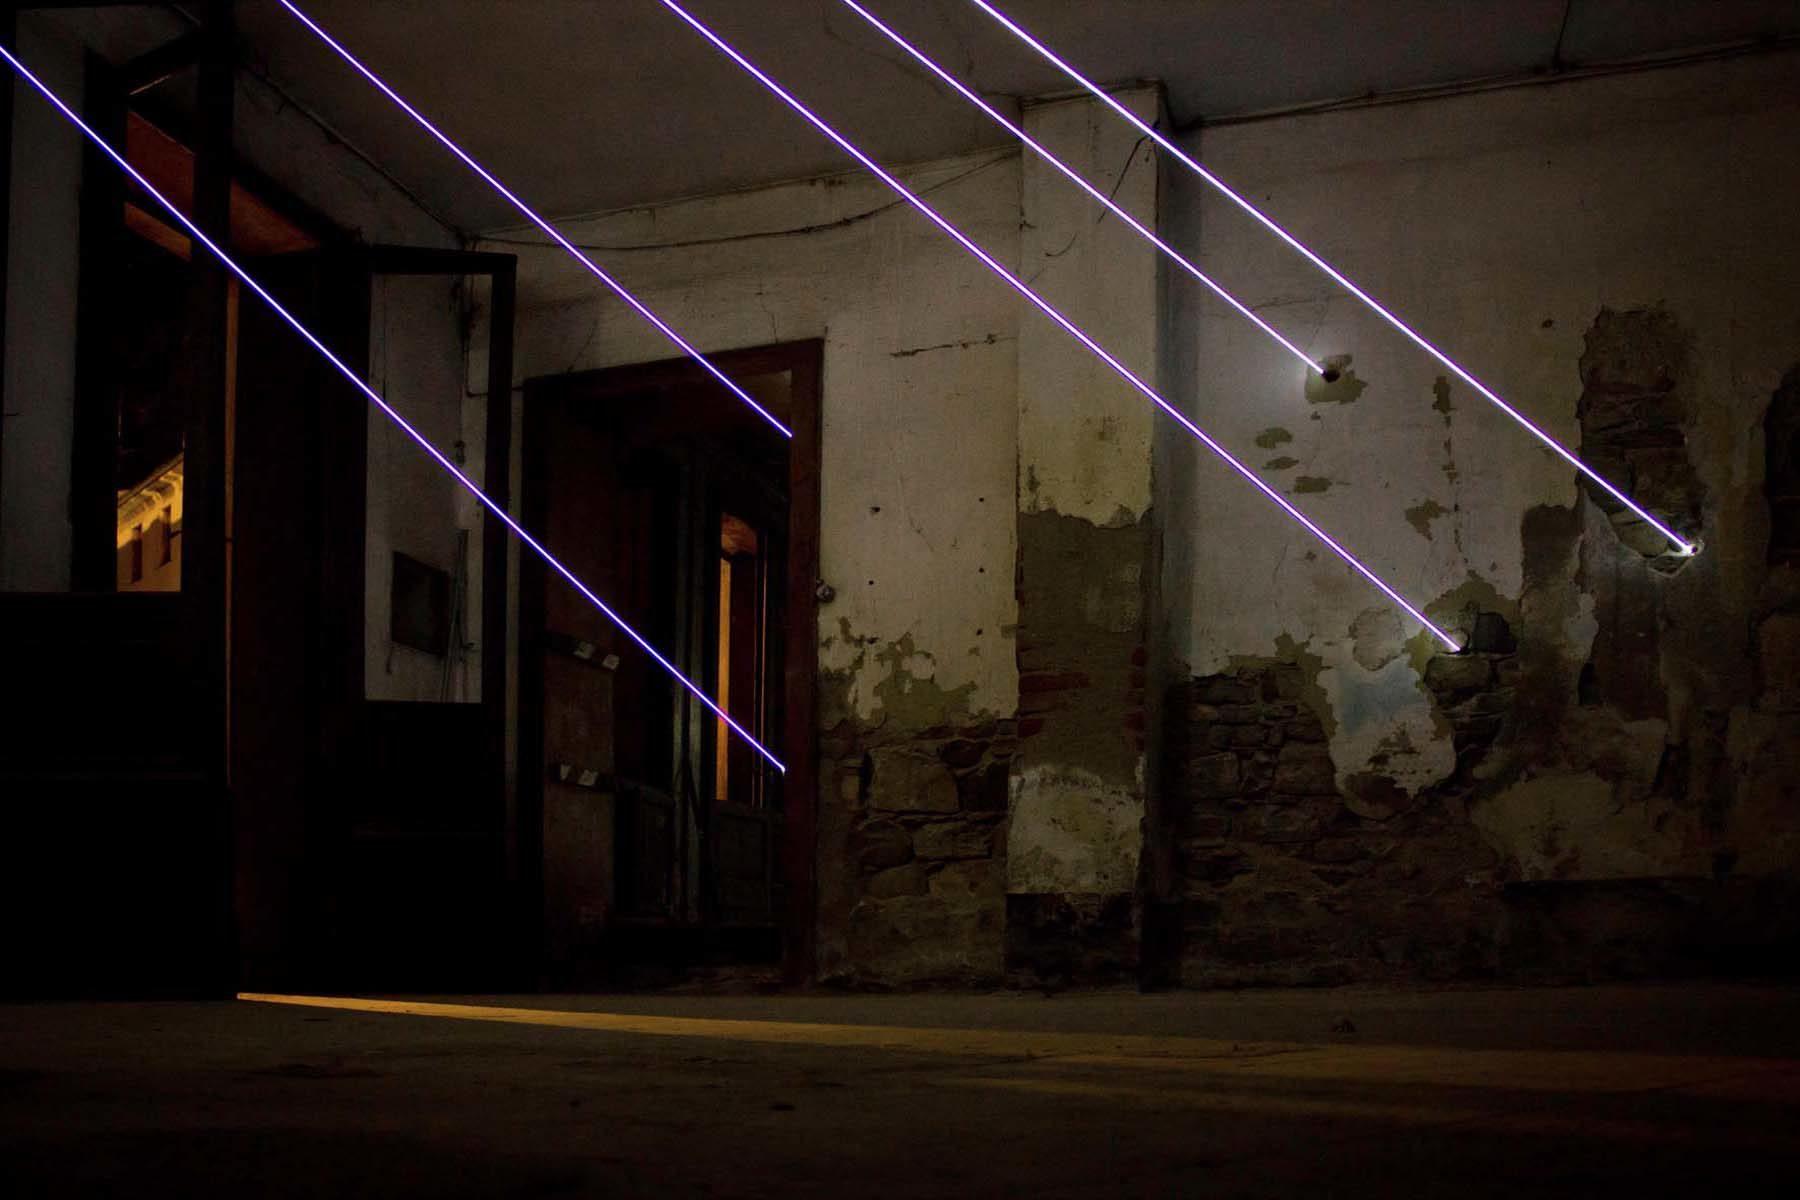 Carlo Bernardini, Aprite la luce, 2011, optical fiber steal, Palazzo Anas, Vittorio Veneto, ph. N.Covre